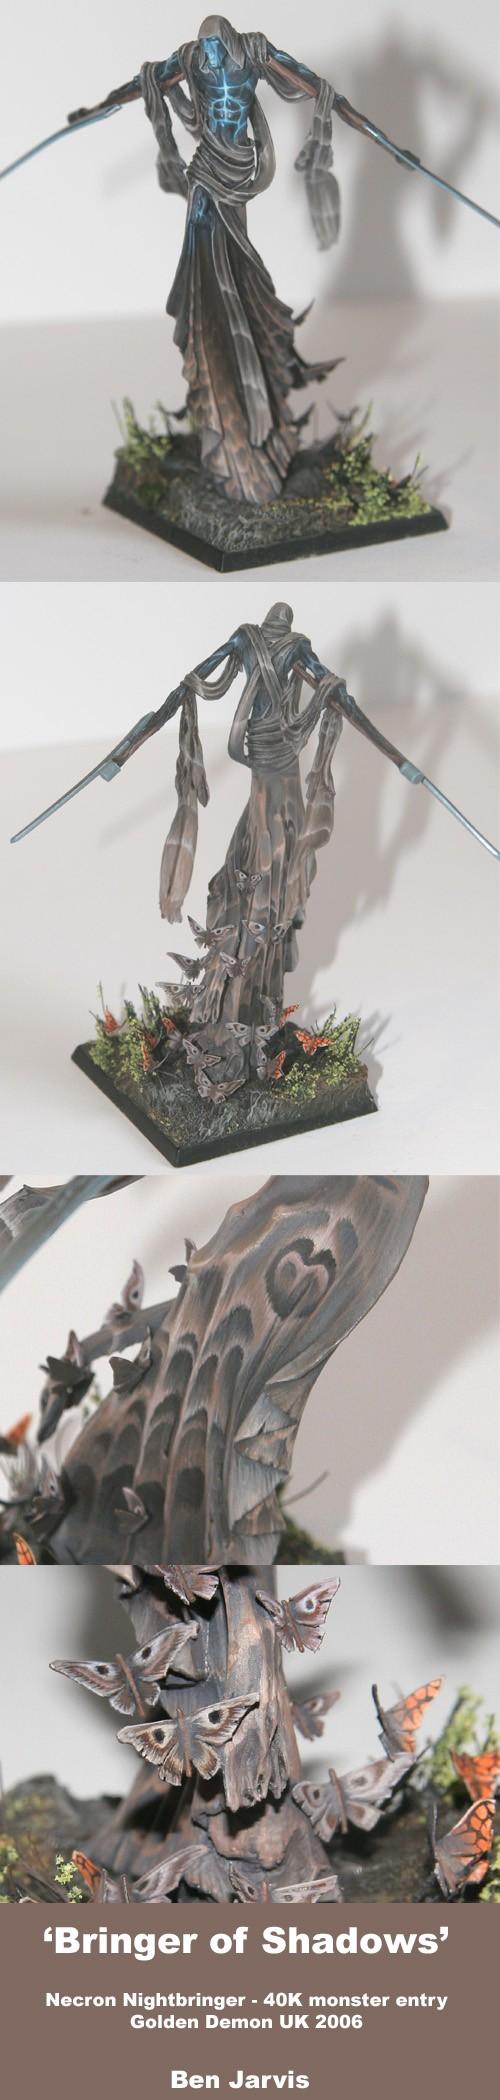 Necron Nightbringer - UK Golden Demon Entry